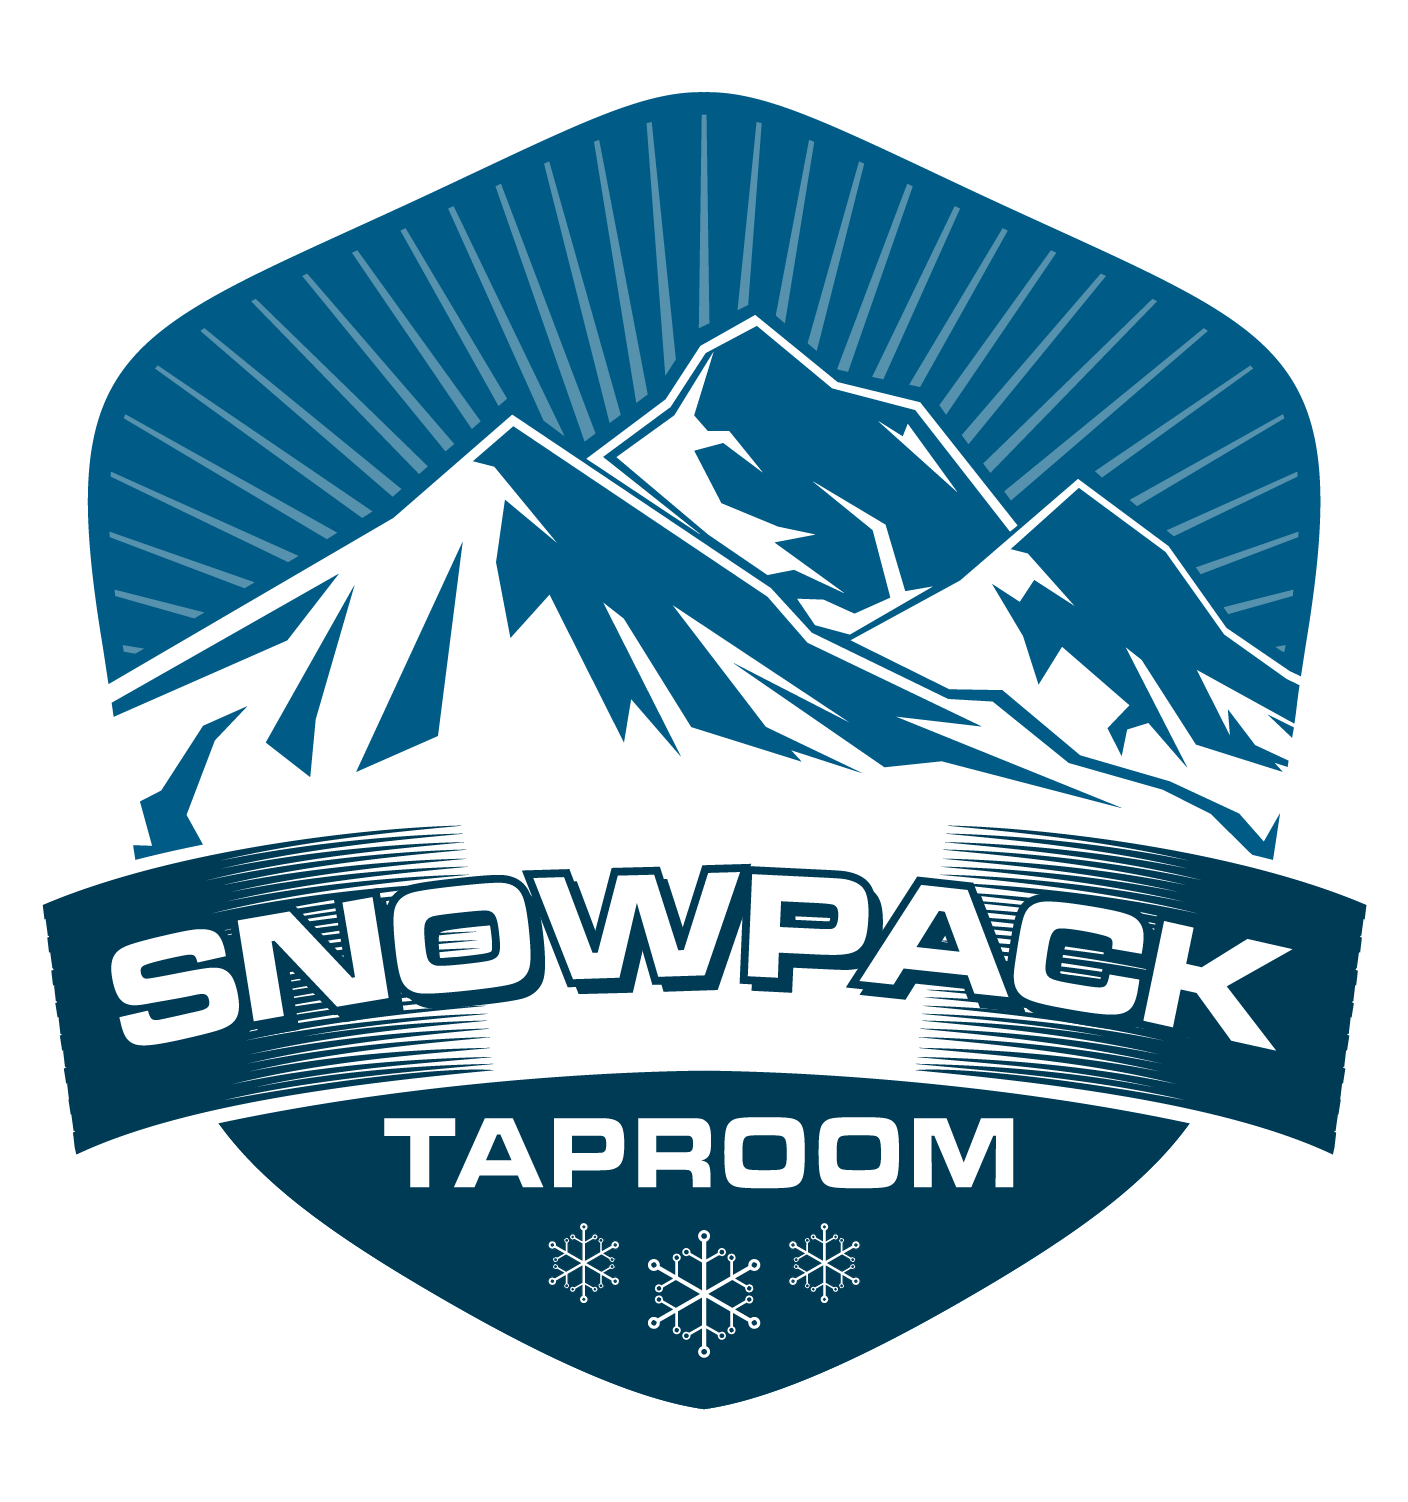 Snow Pack Taproom Logo